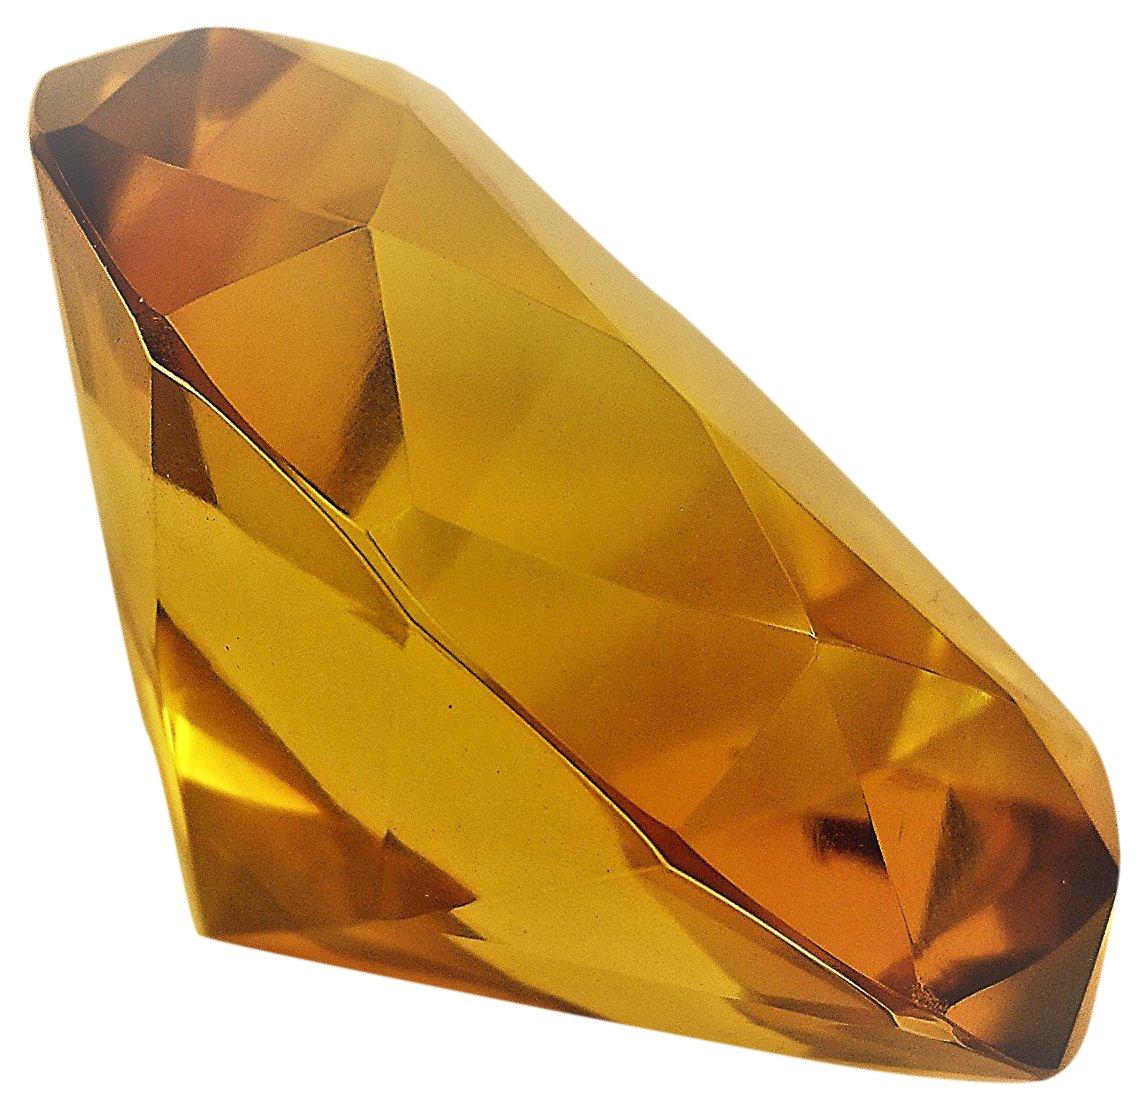 Hongville Fancy 80 mm Crystal Glass Diamond Paperweight, Orange